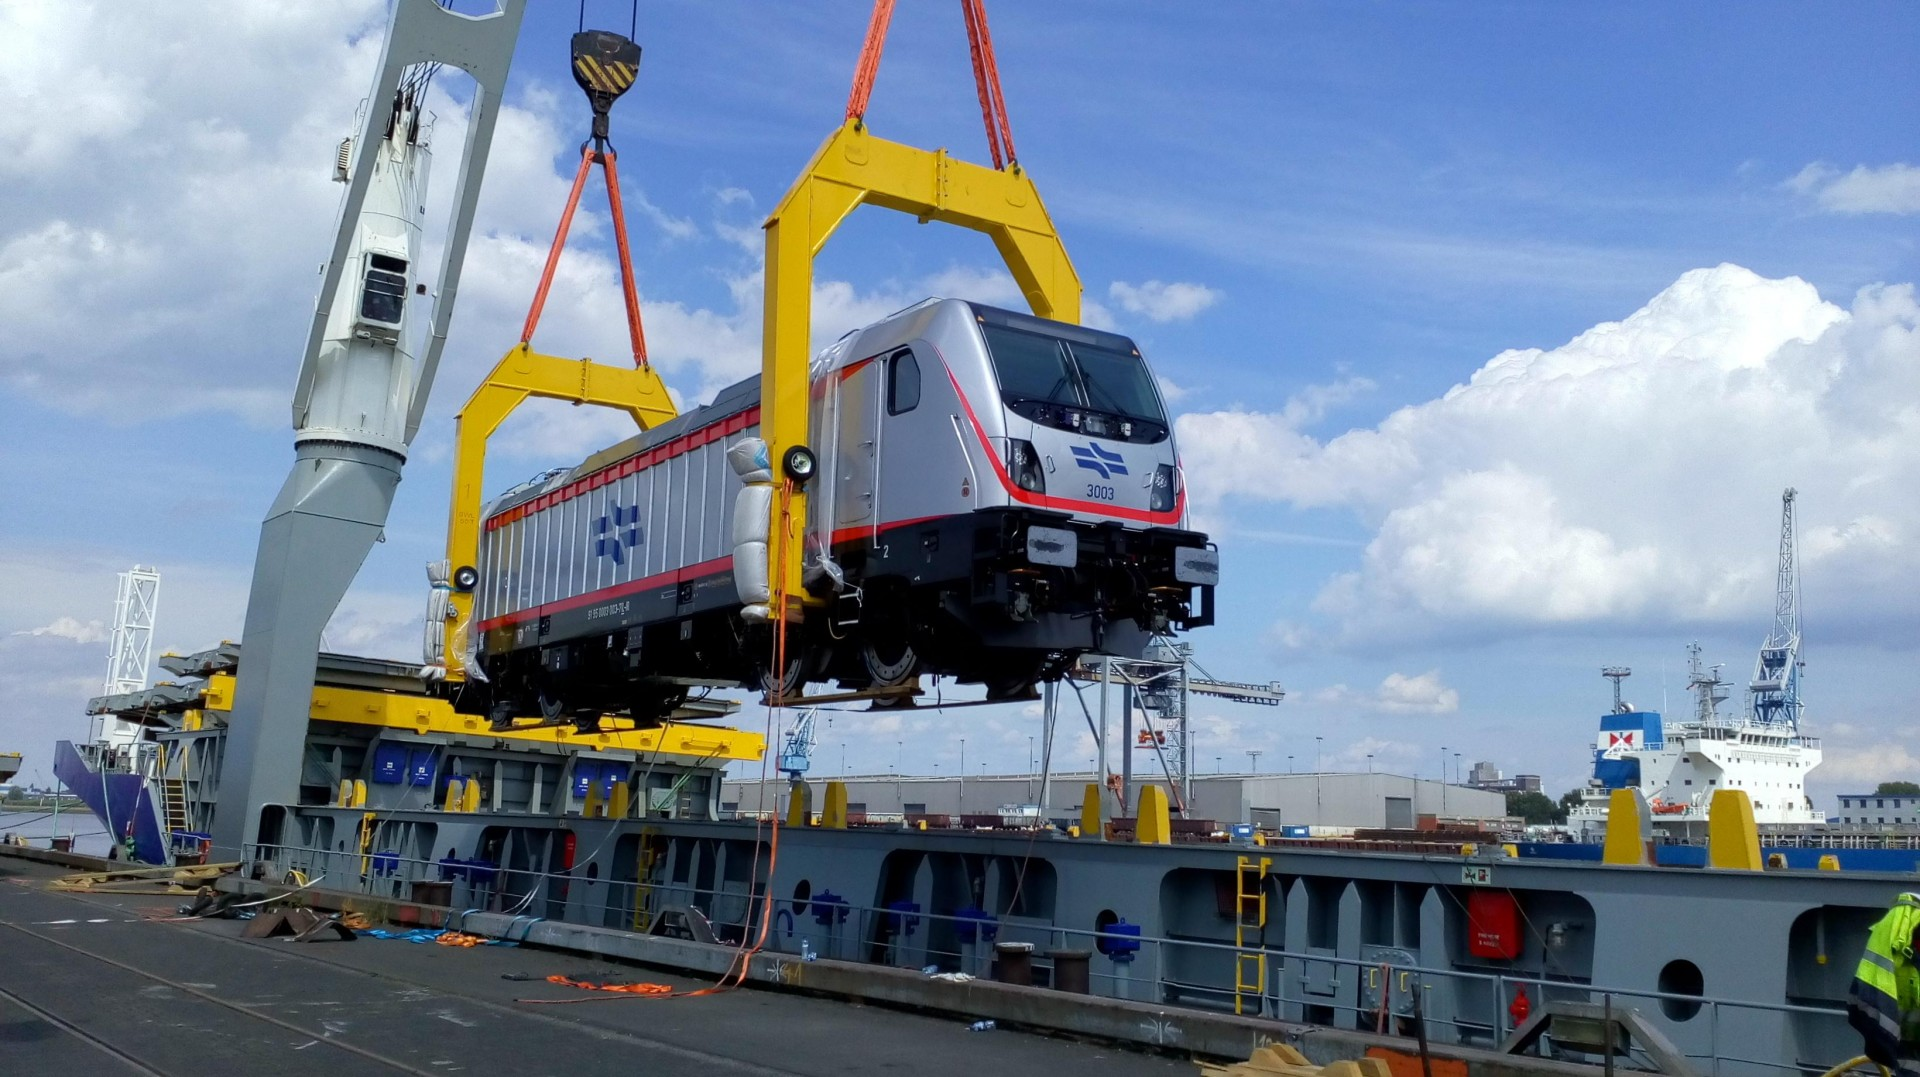 Train lift frame